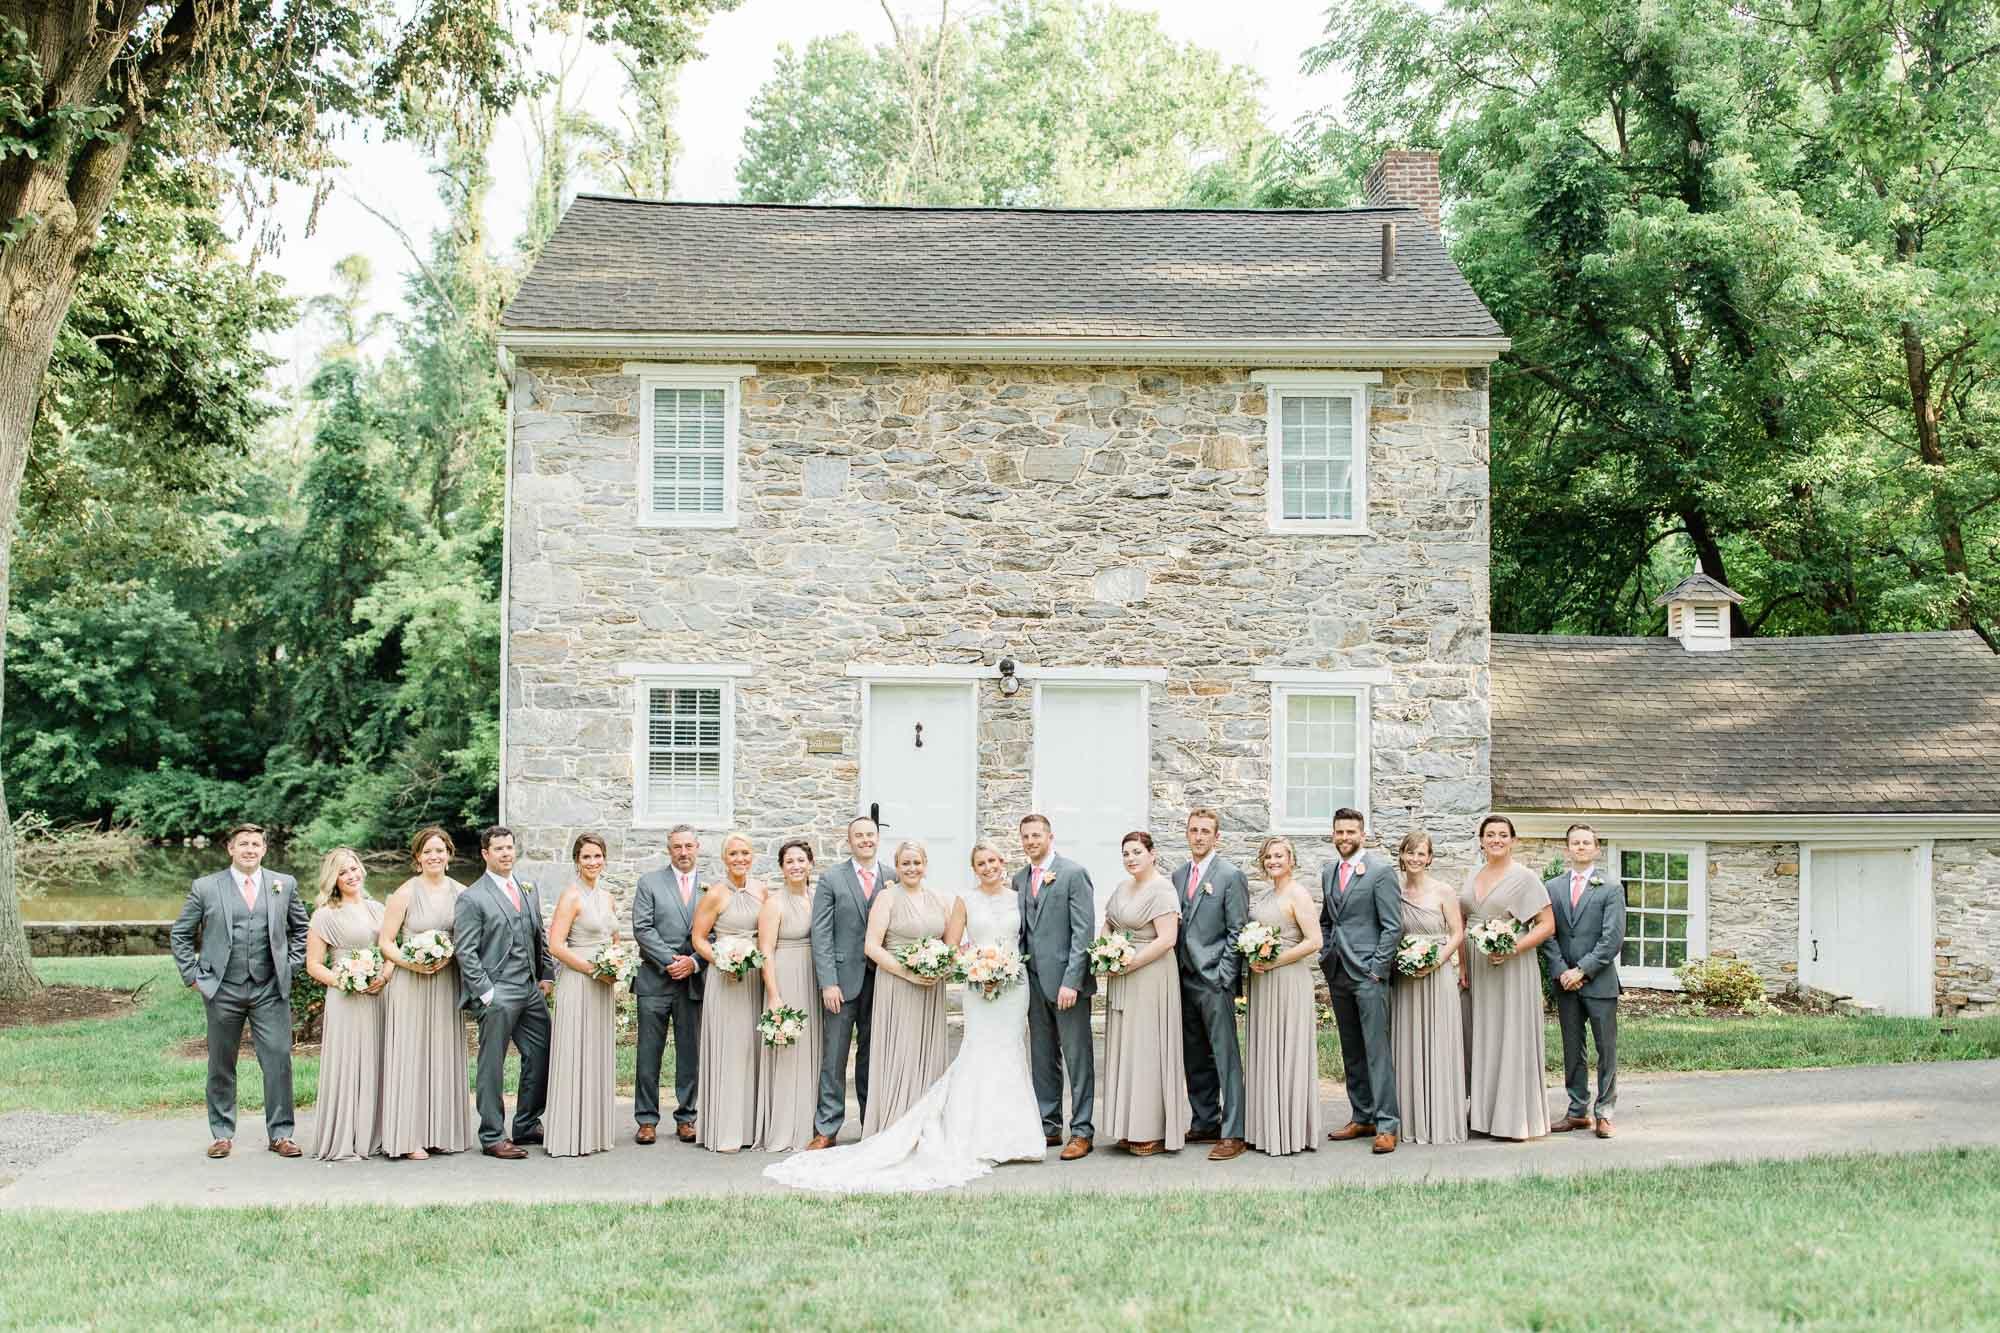 Allenberry-resort-historic-pennsylvania-wedding-10230.jpg